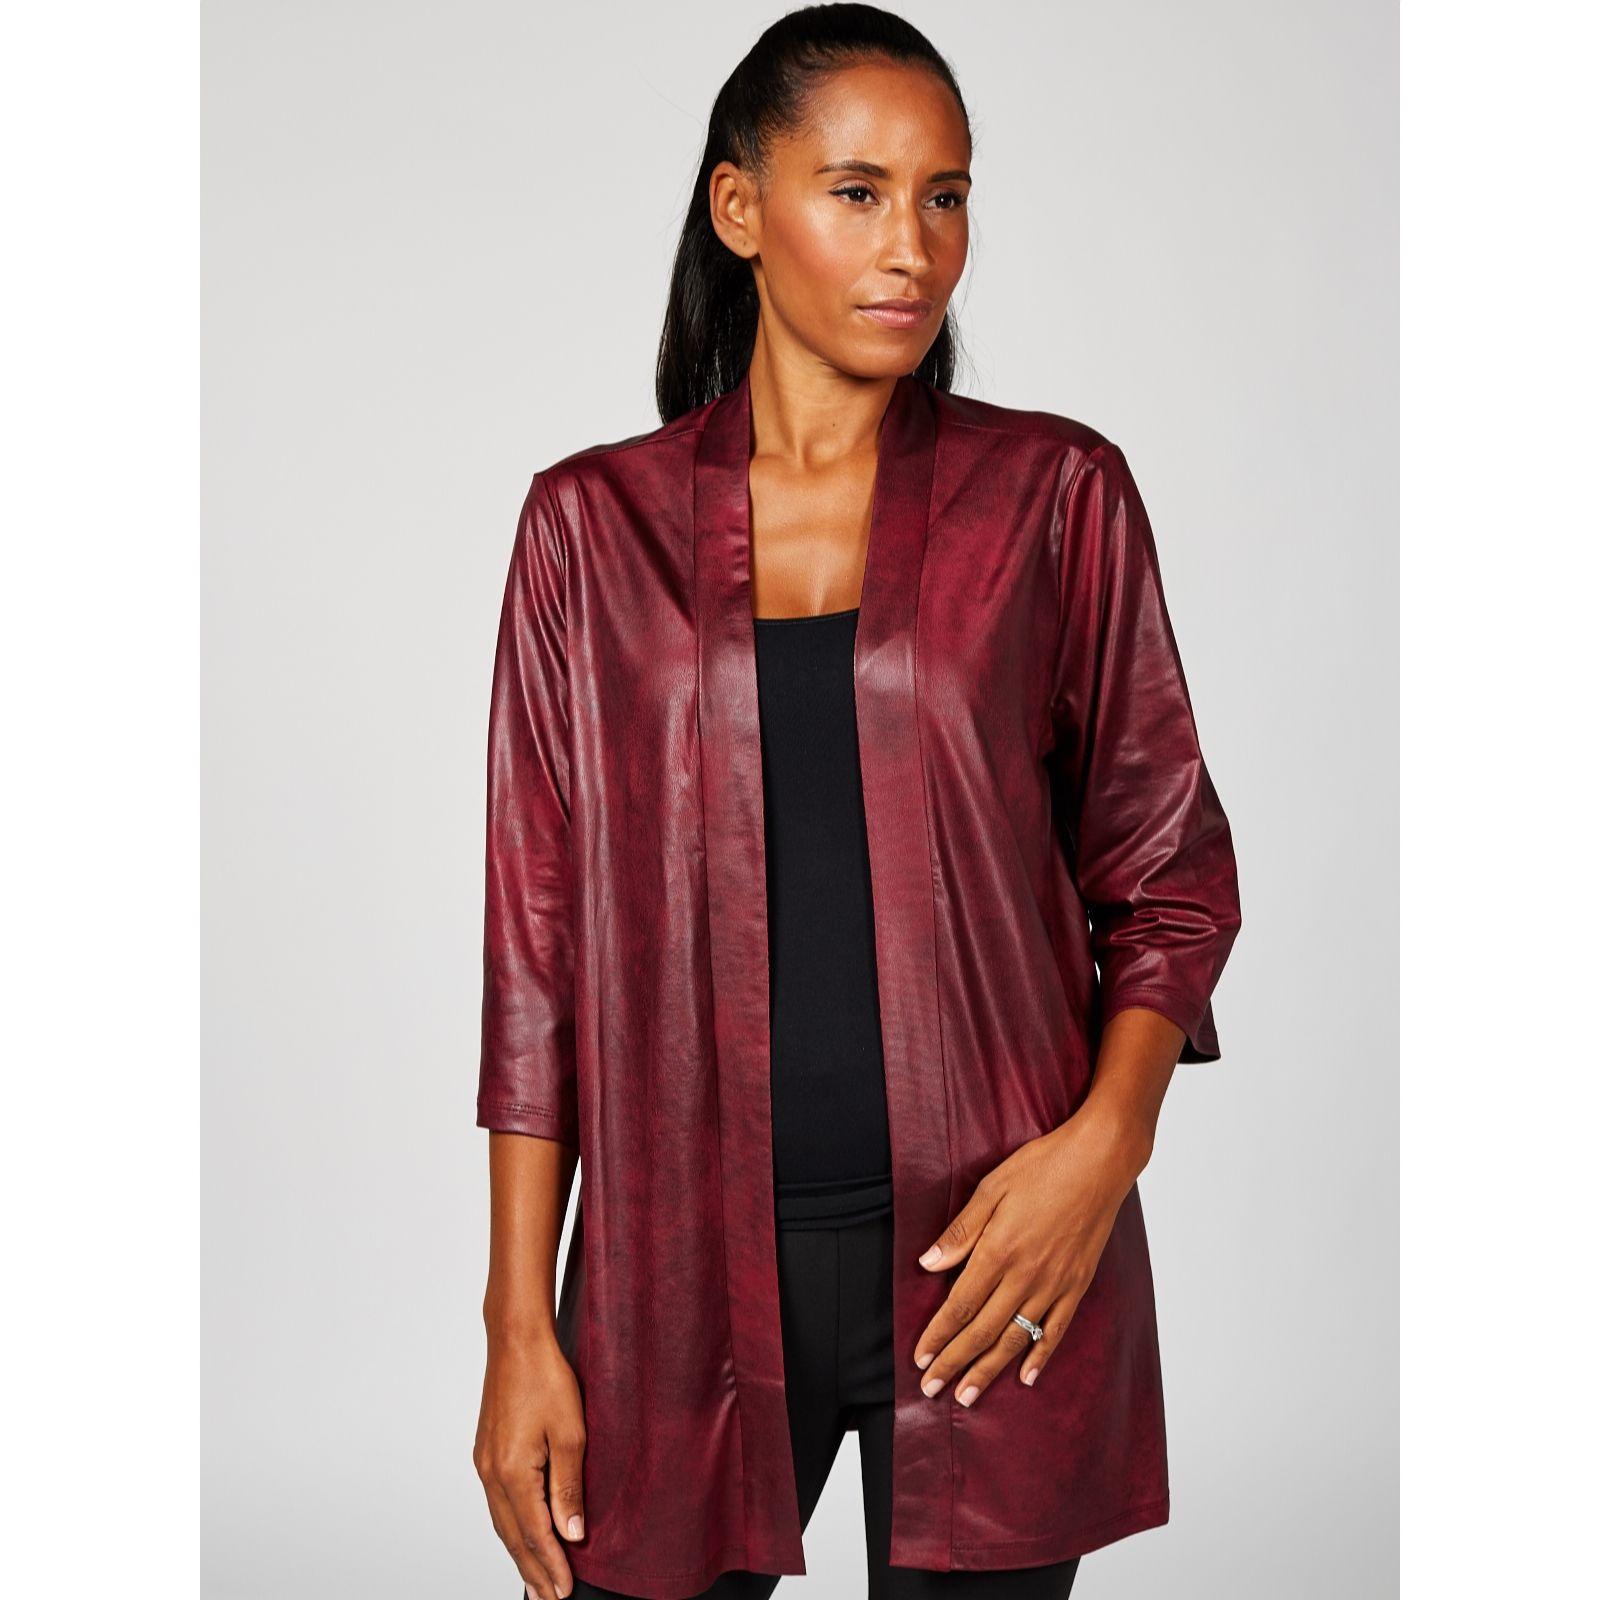 190f094f05a Kim   Co Brazil Jersey 3 4 Sleeve Pleather Kimono Cardigan - QVC UK